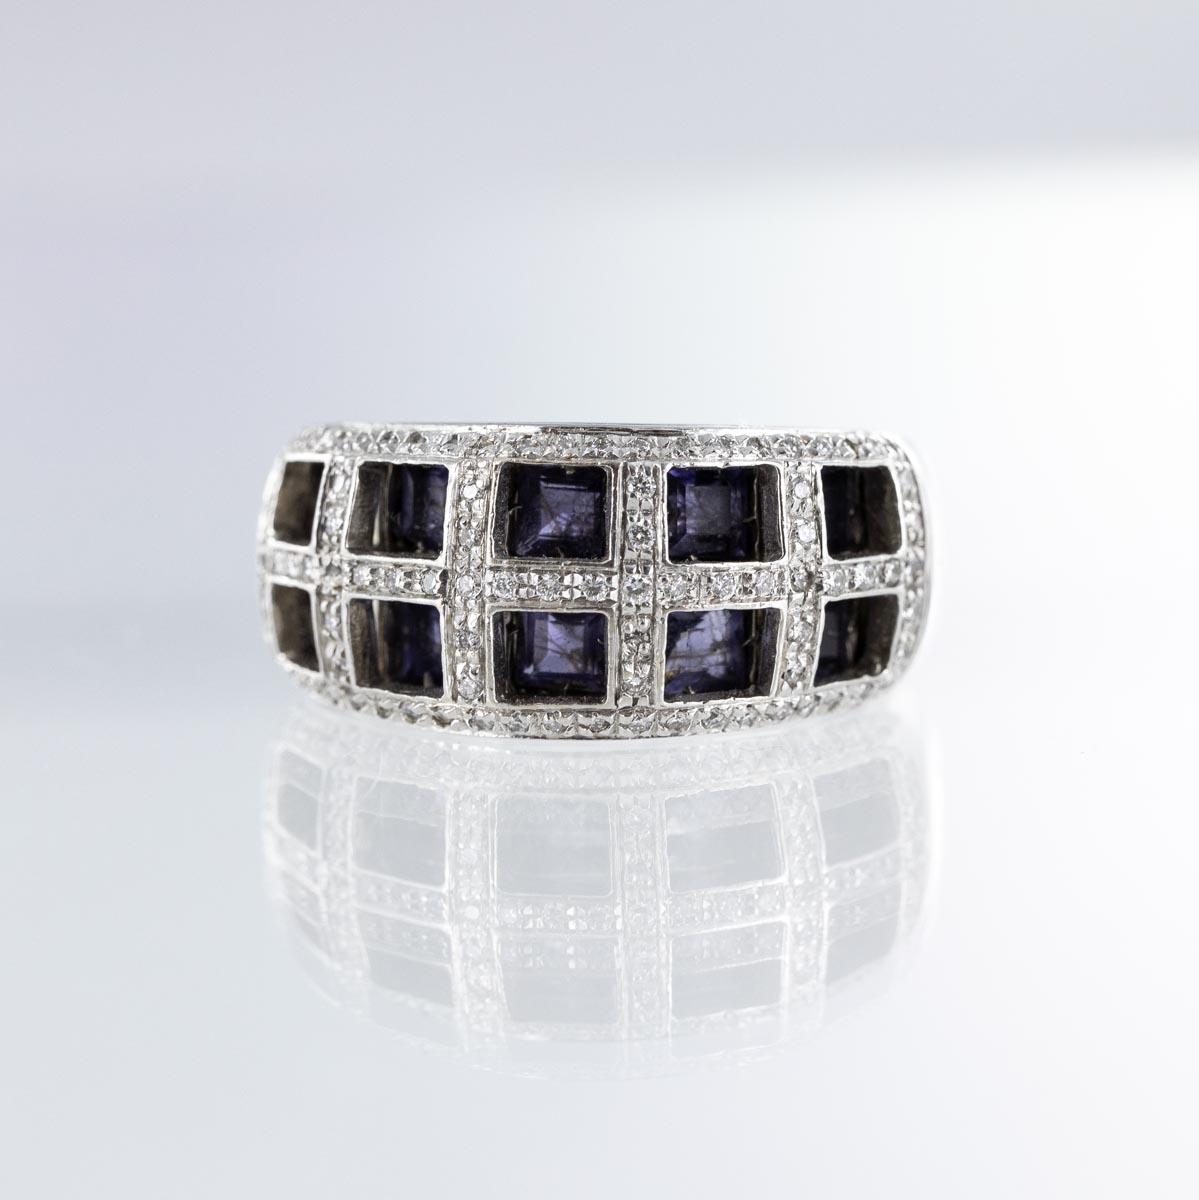 Bague jonc quadrillage diamants